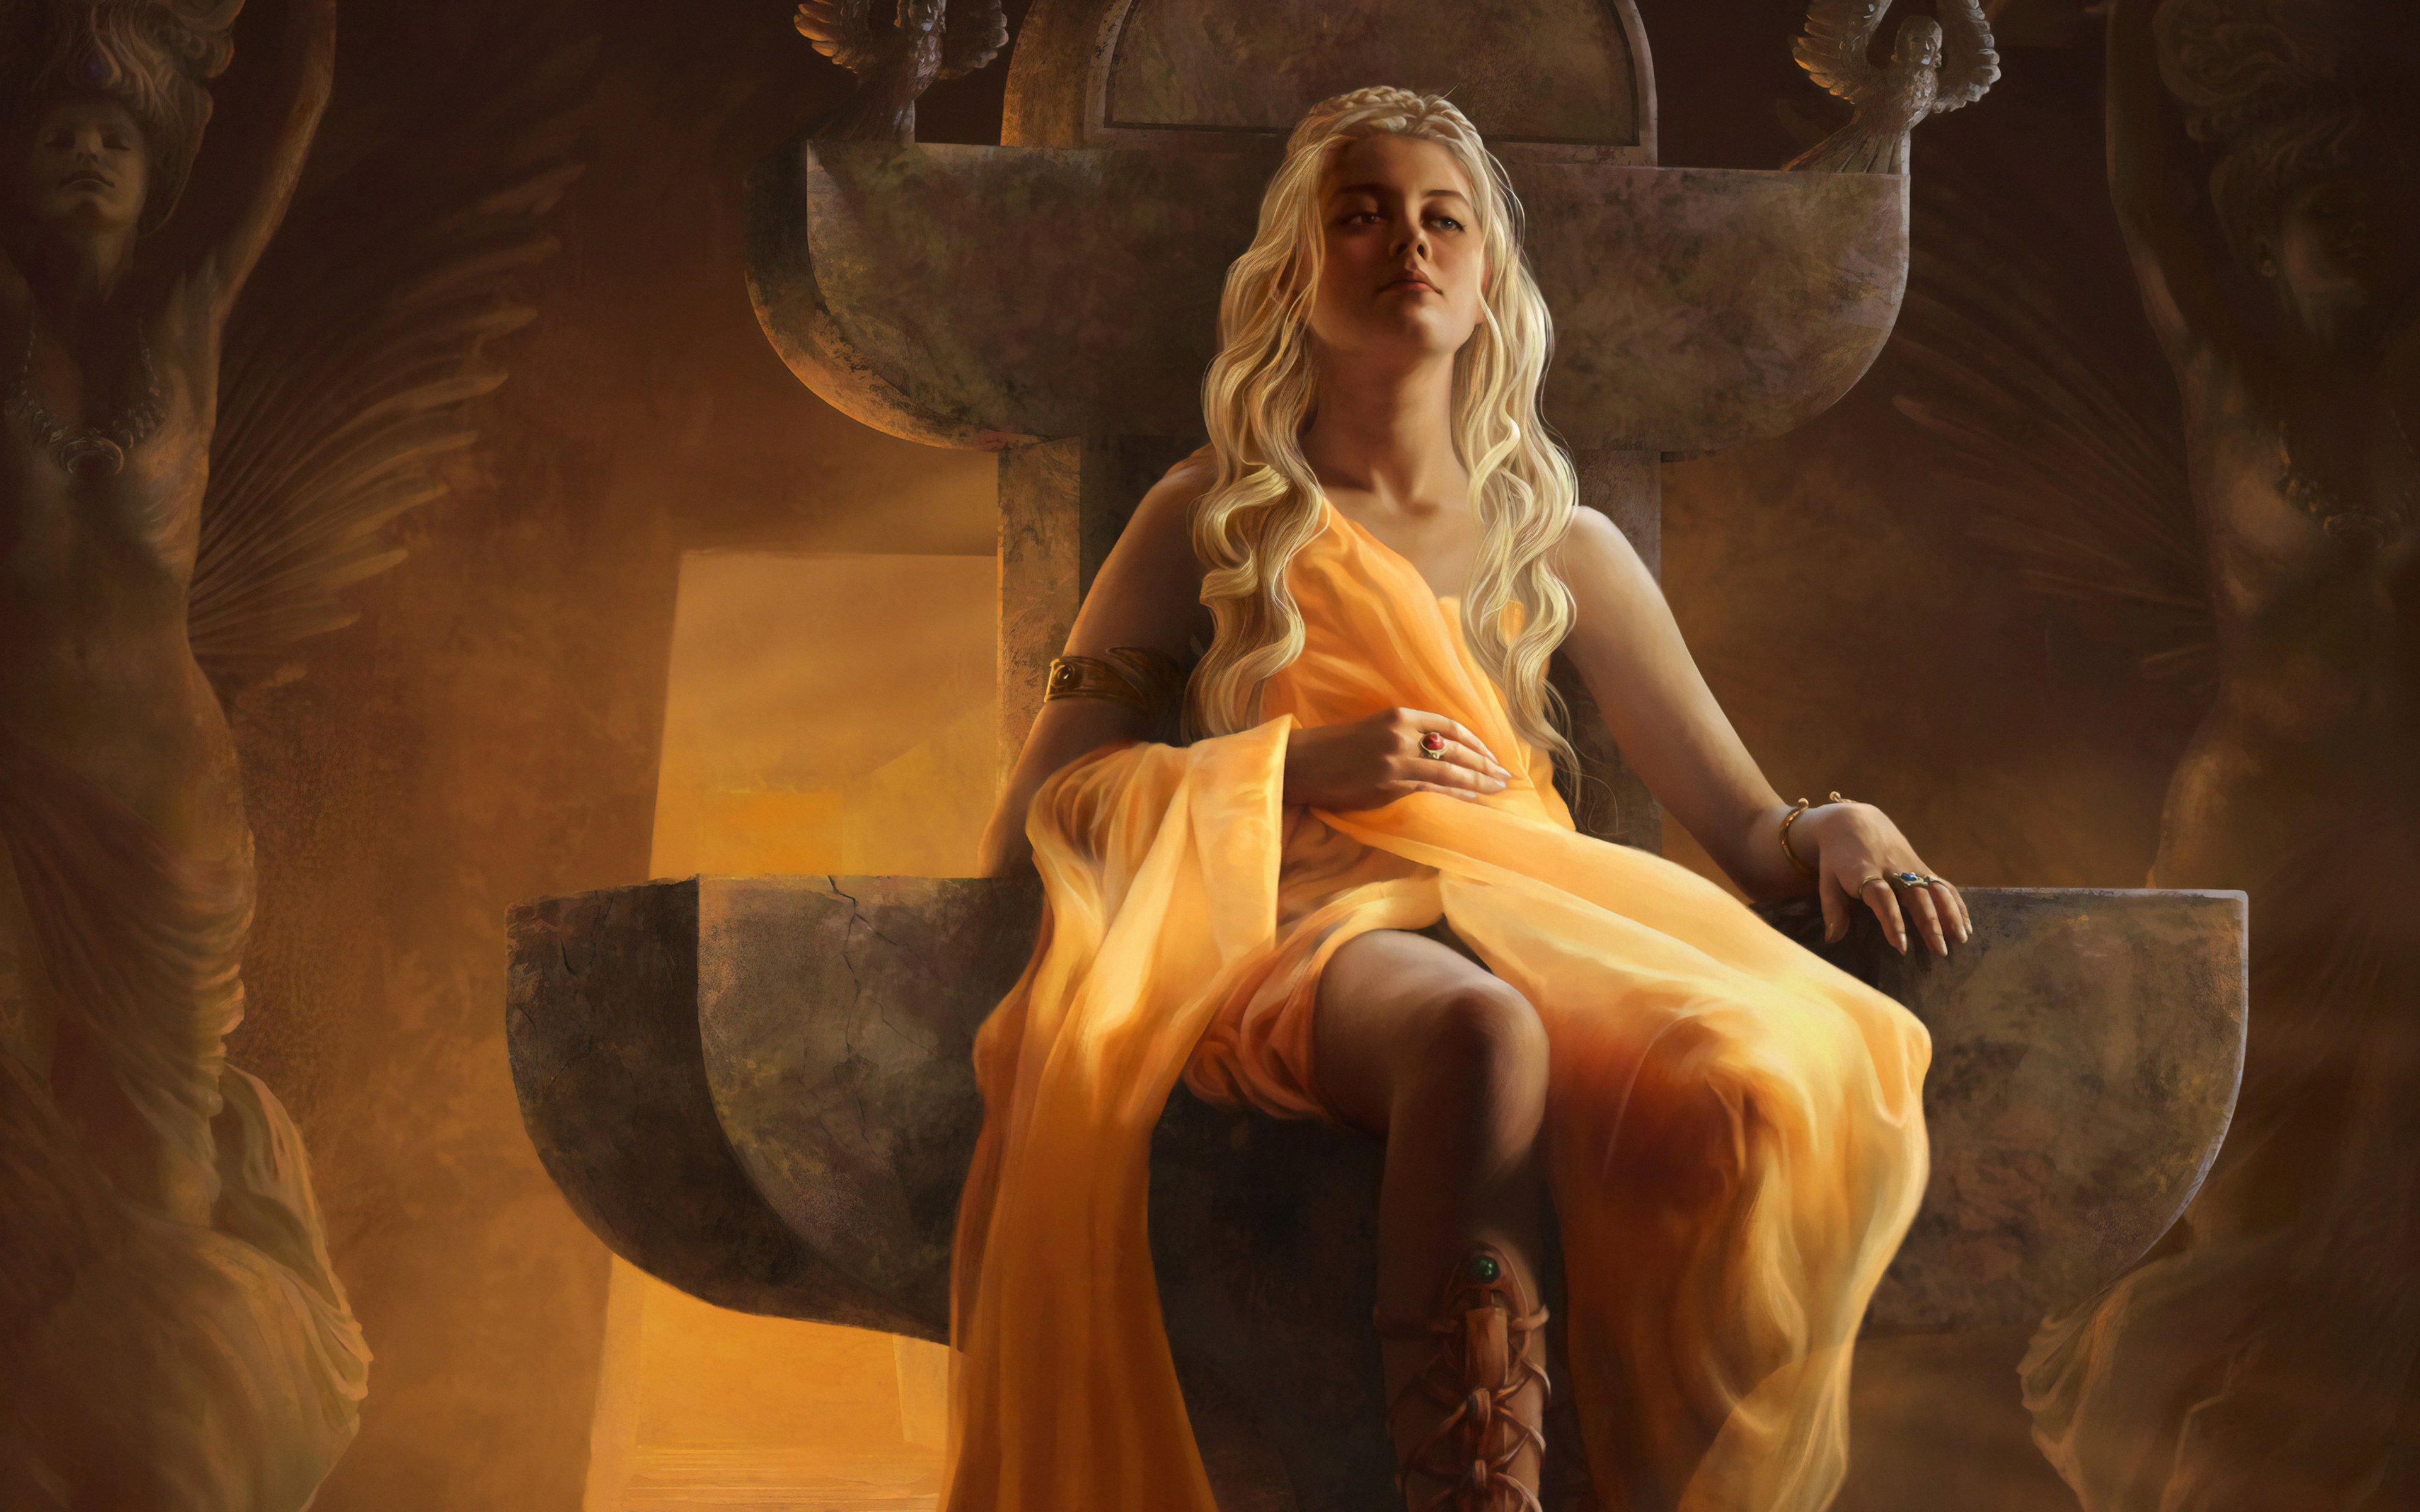 Fondos de pantalla Daenerys Targaryen Fanart